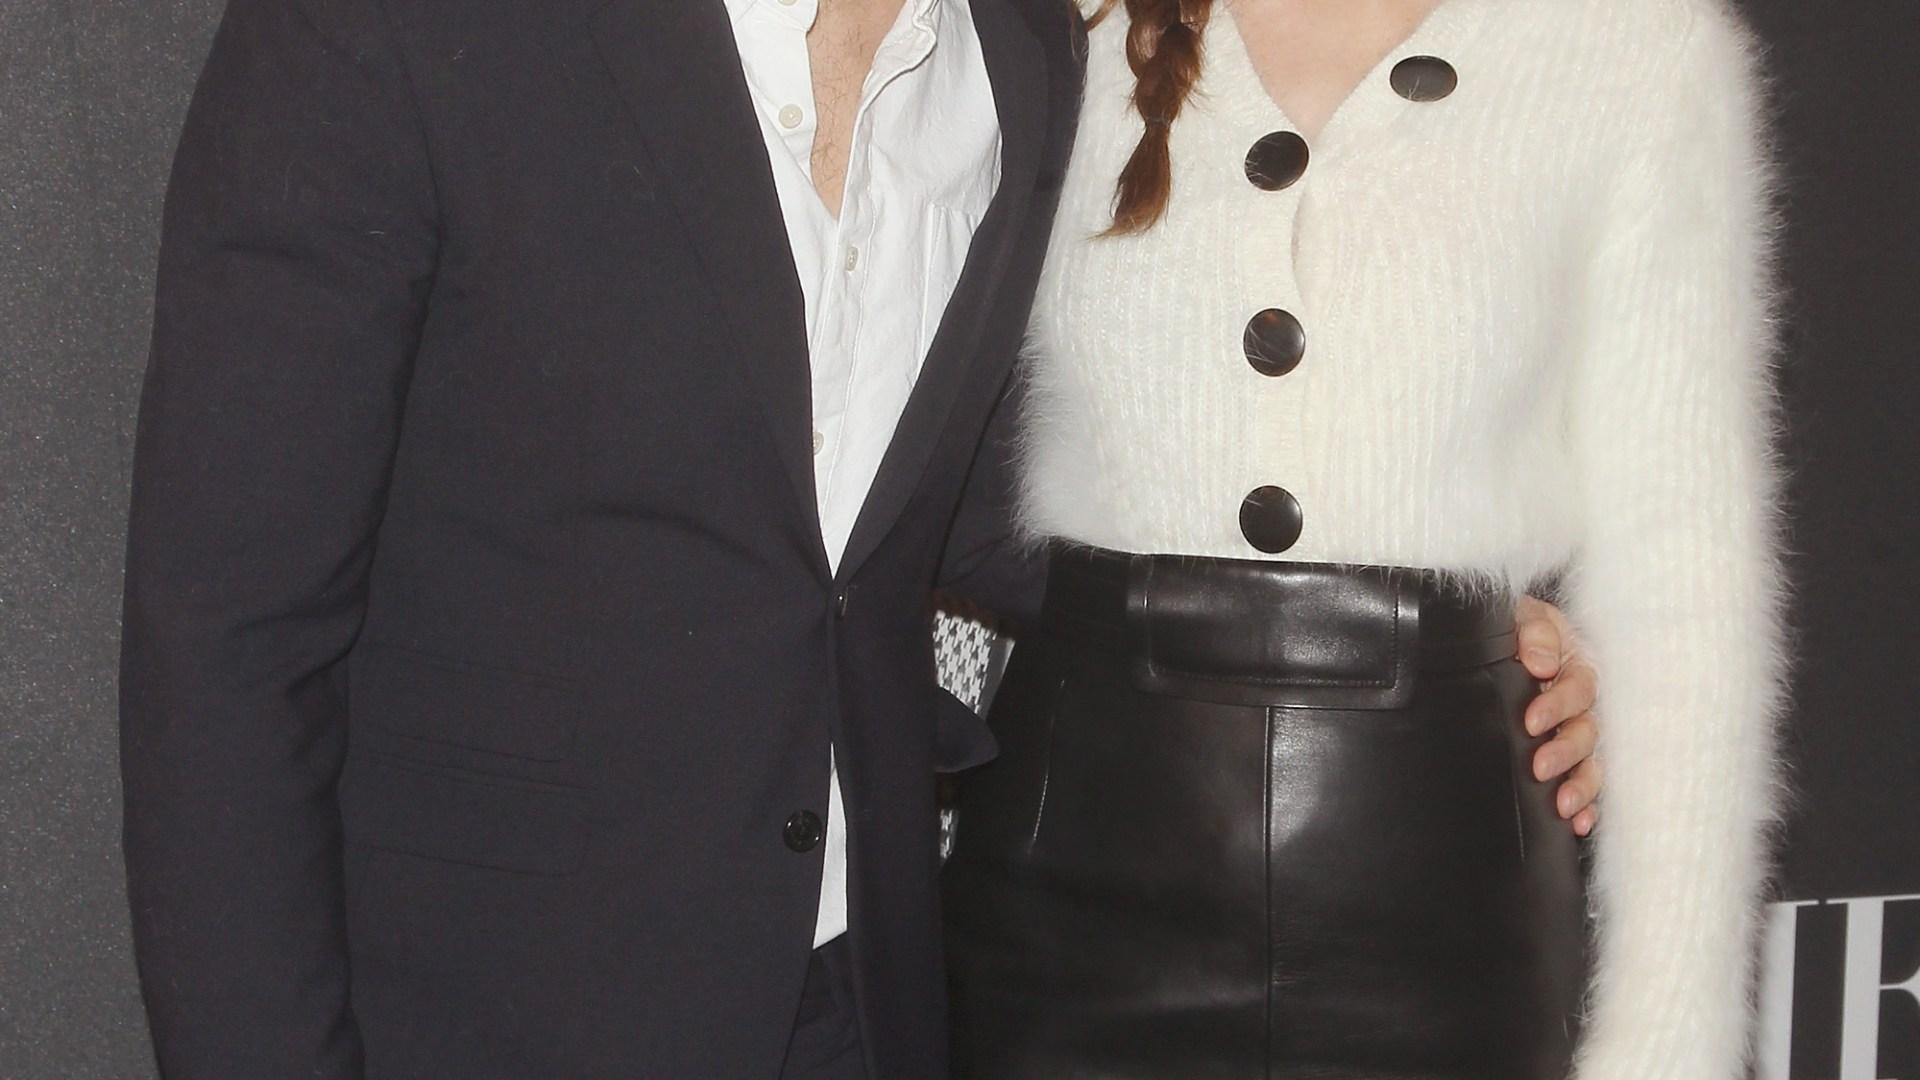 Fifty Shades of Grey Star Dakota Johnson Poses Fully